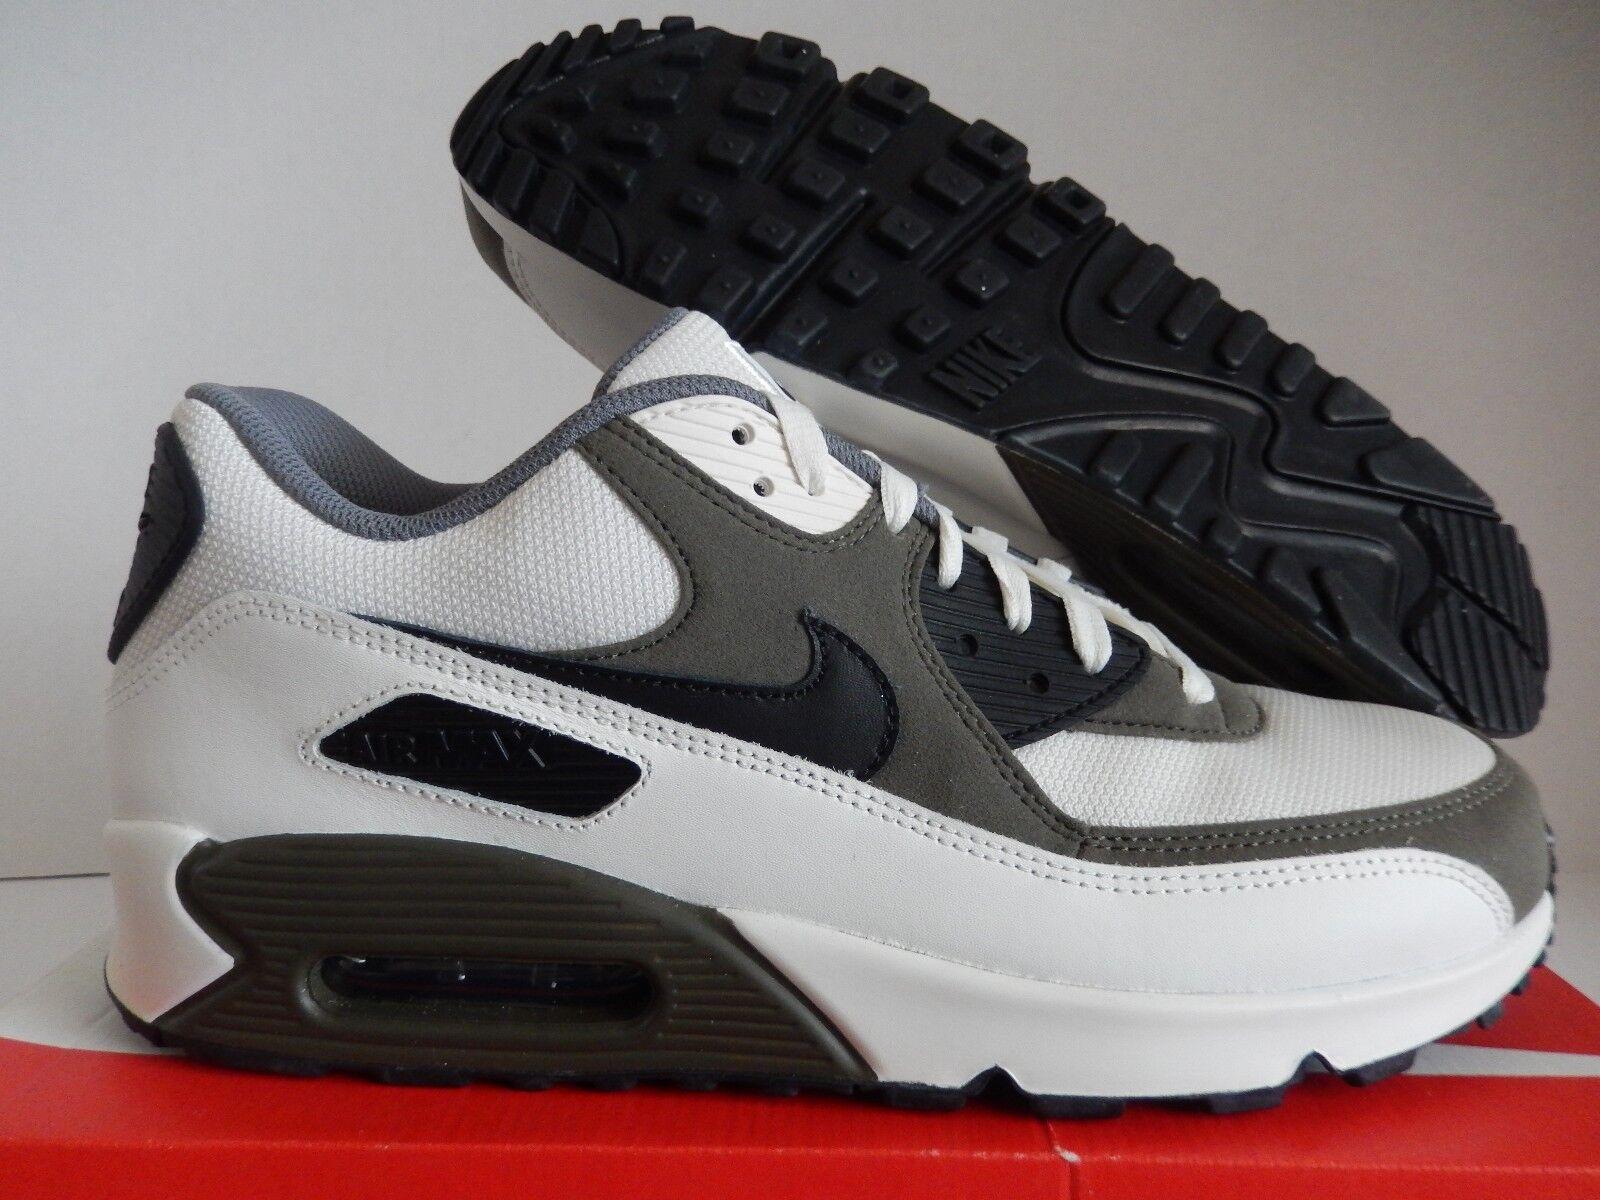 Nike air max 90 id white-sail-olive green-nero sz 12 maglie il [931902-993]